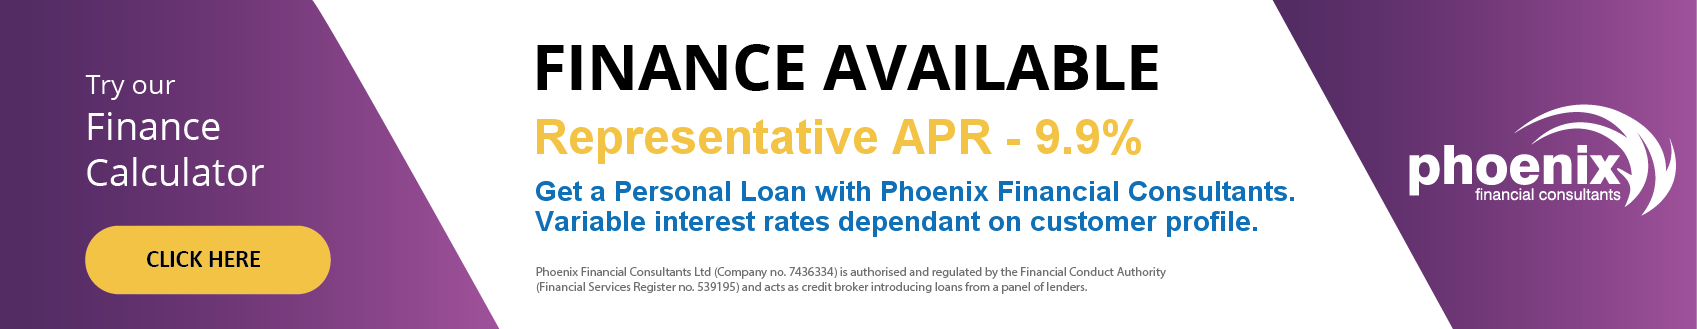 Phoenix Financial Consultants